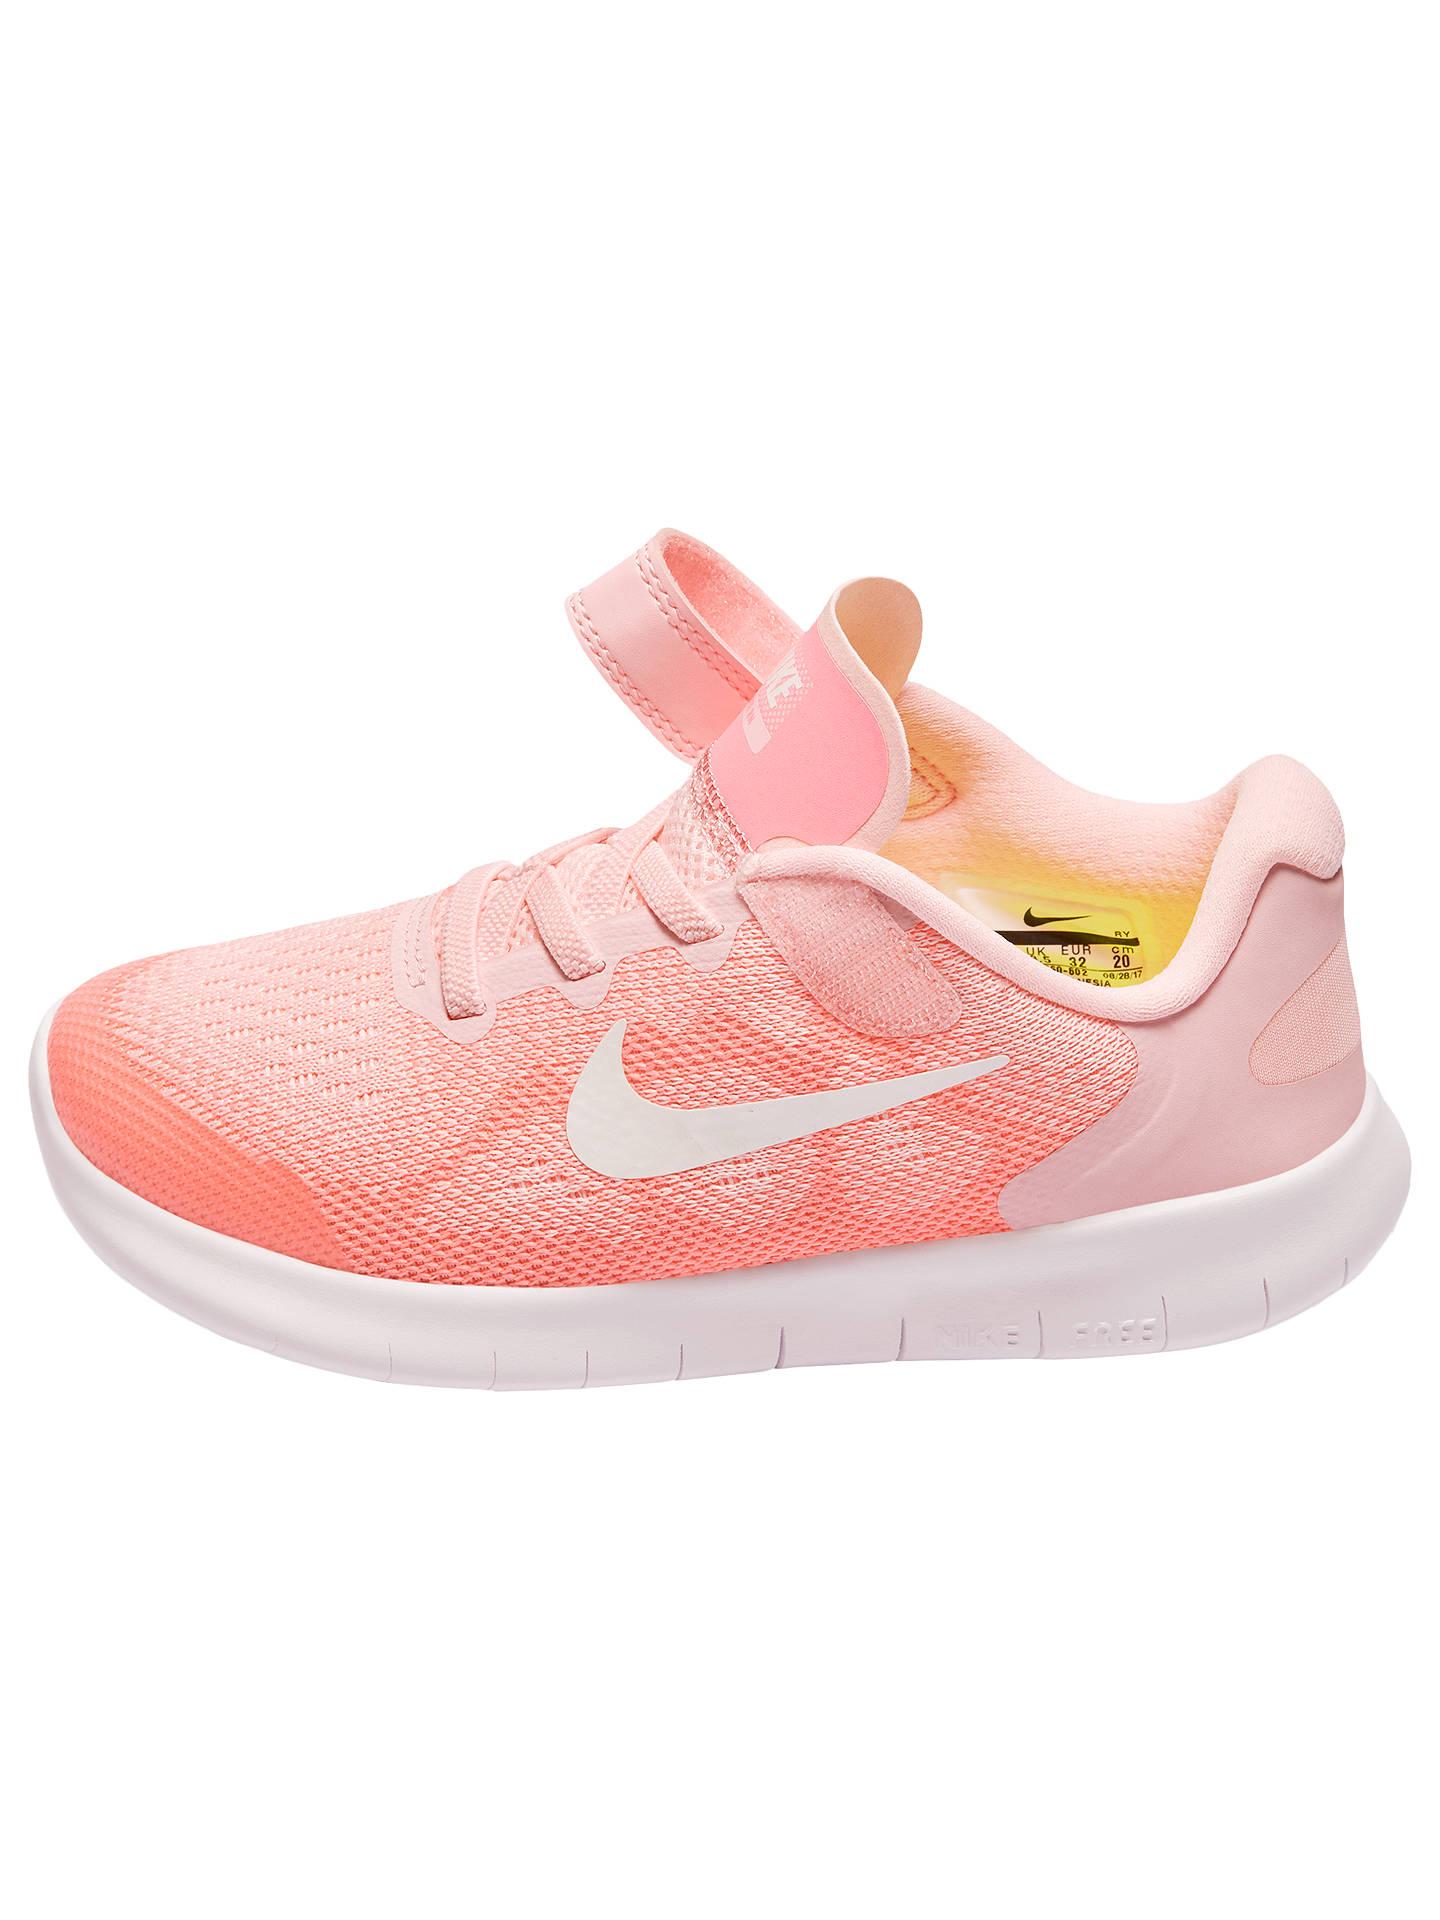 3d45fdb28243 ... Buy Nike Children s Free Run 2017 PS Rip Tape Trainers